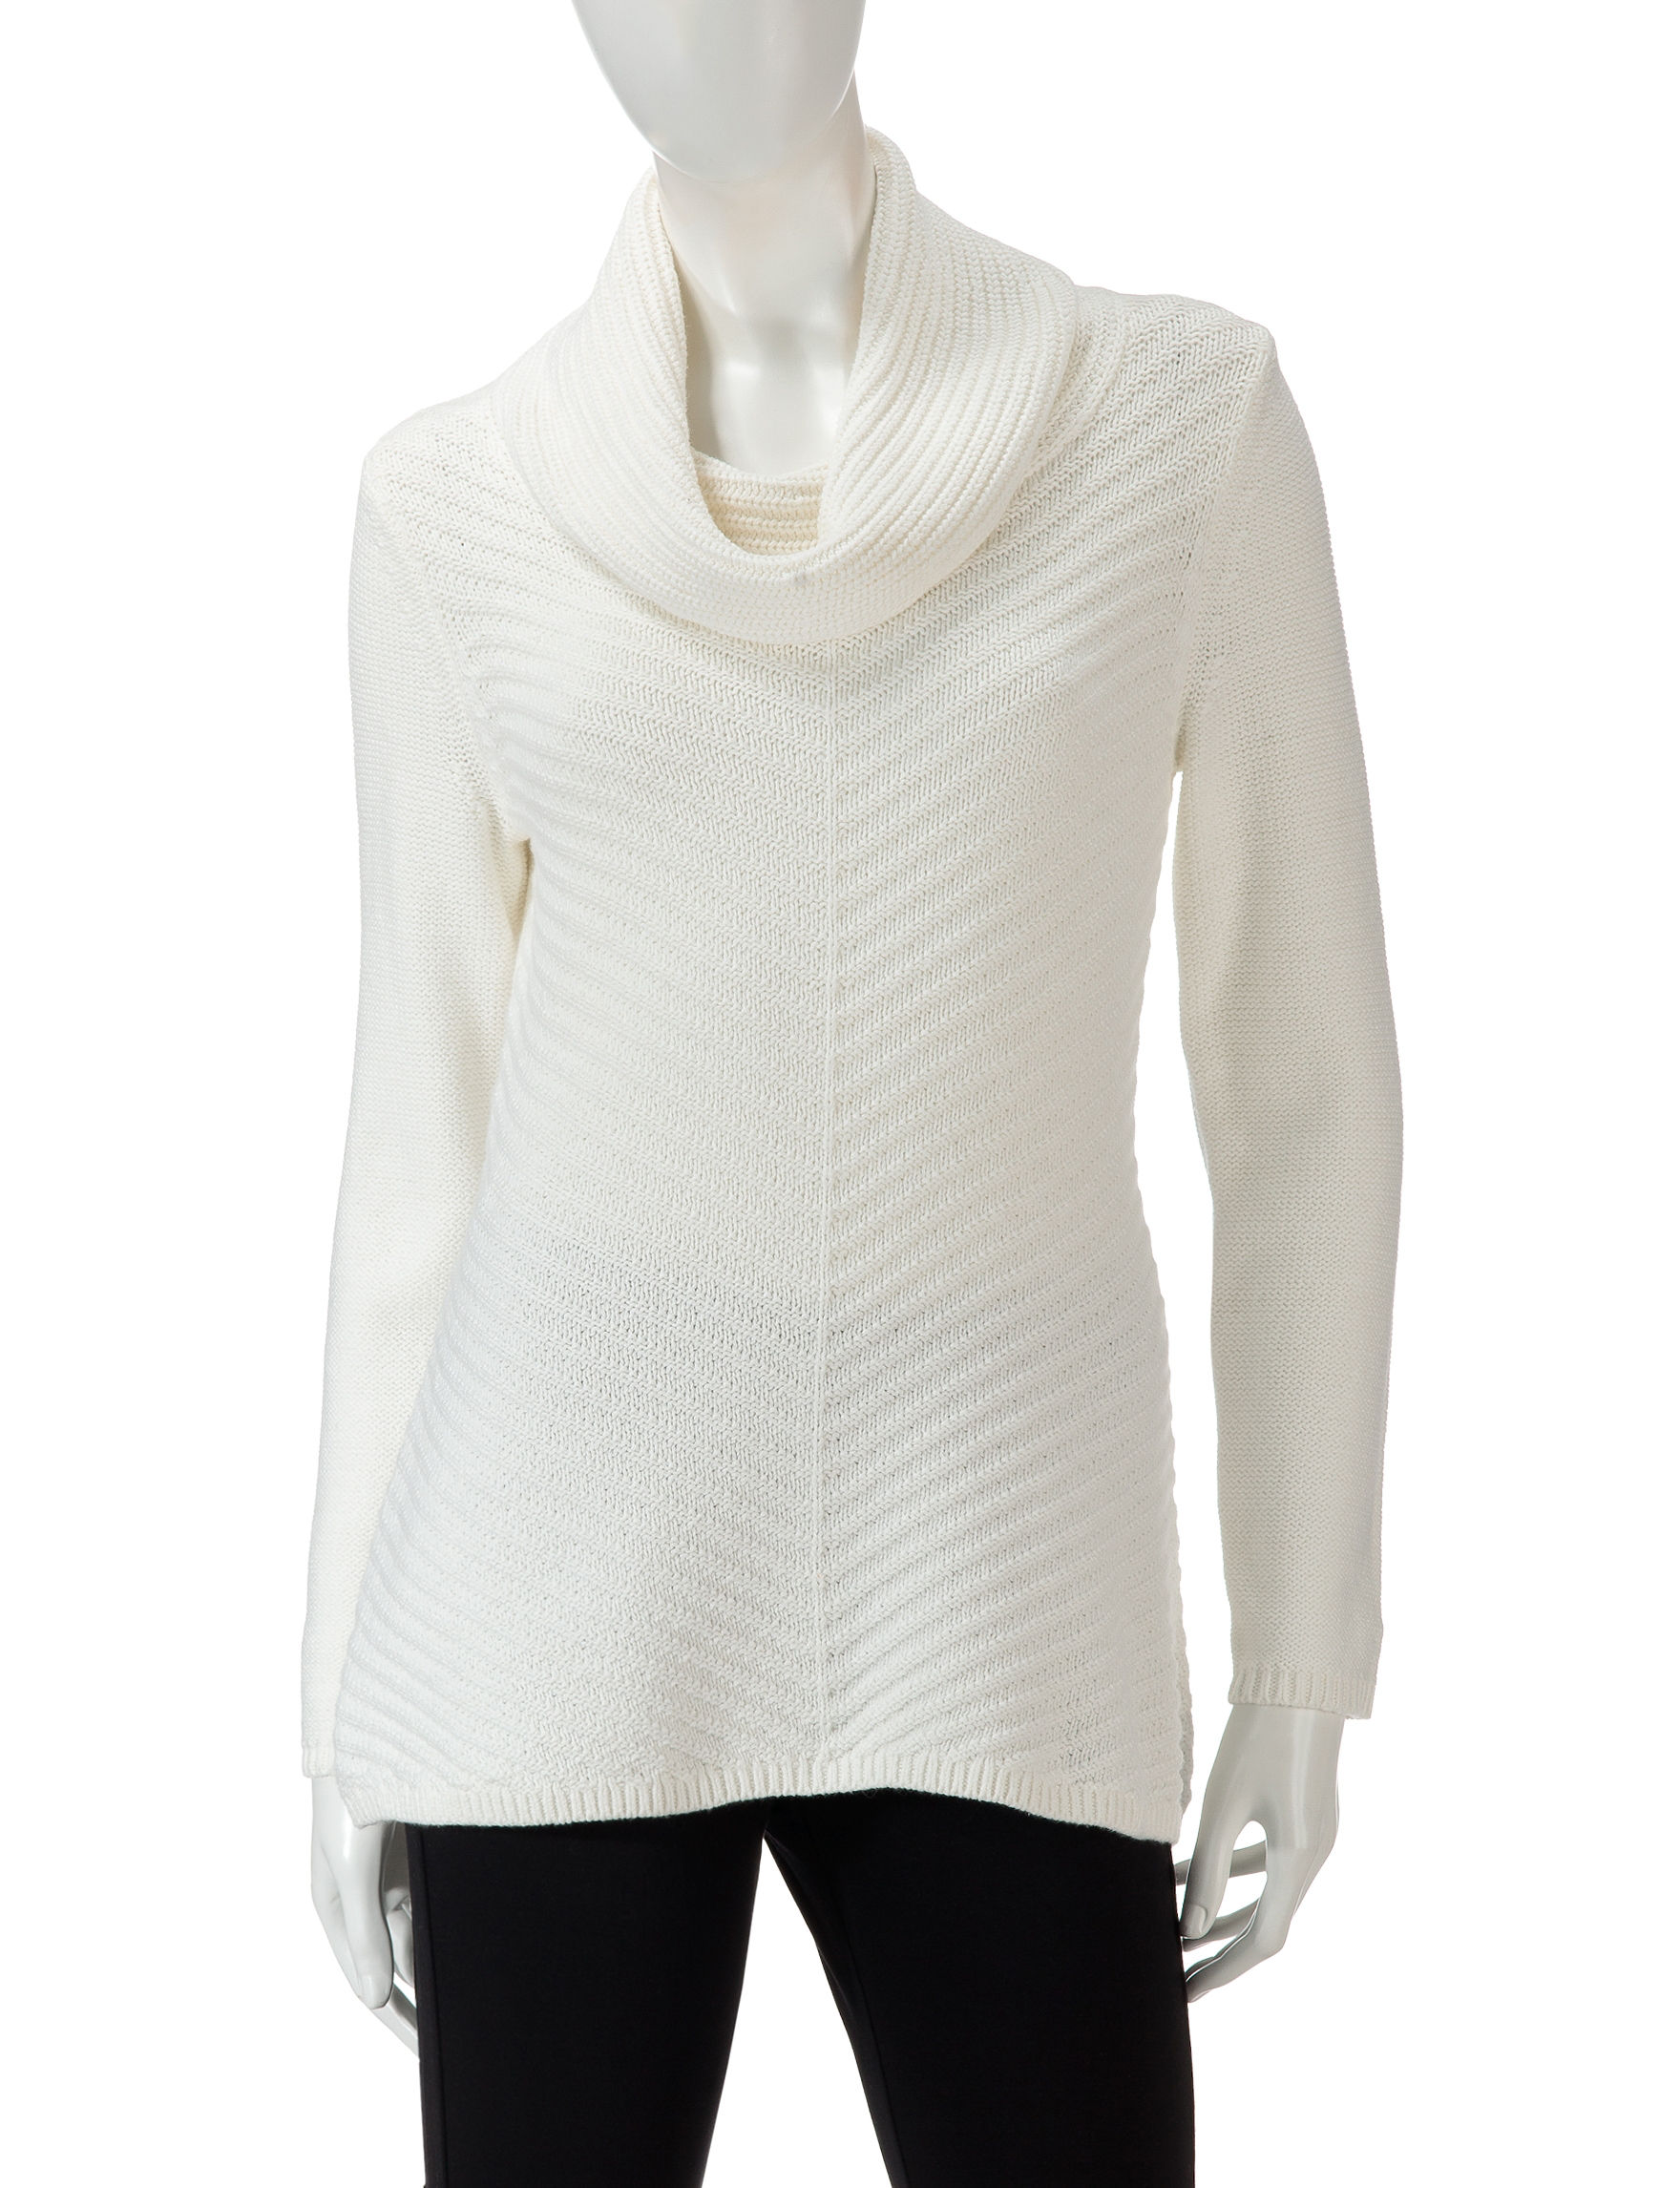 Valerie Stevens Cream Pull-overs Sweaters